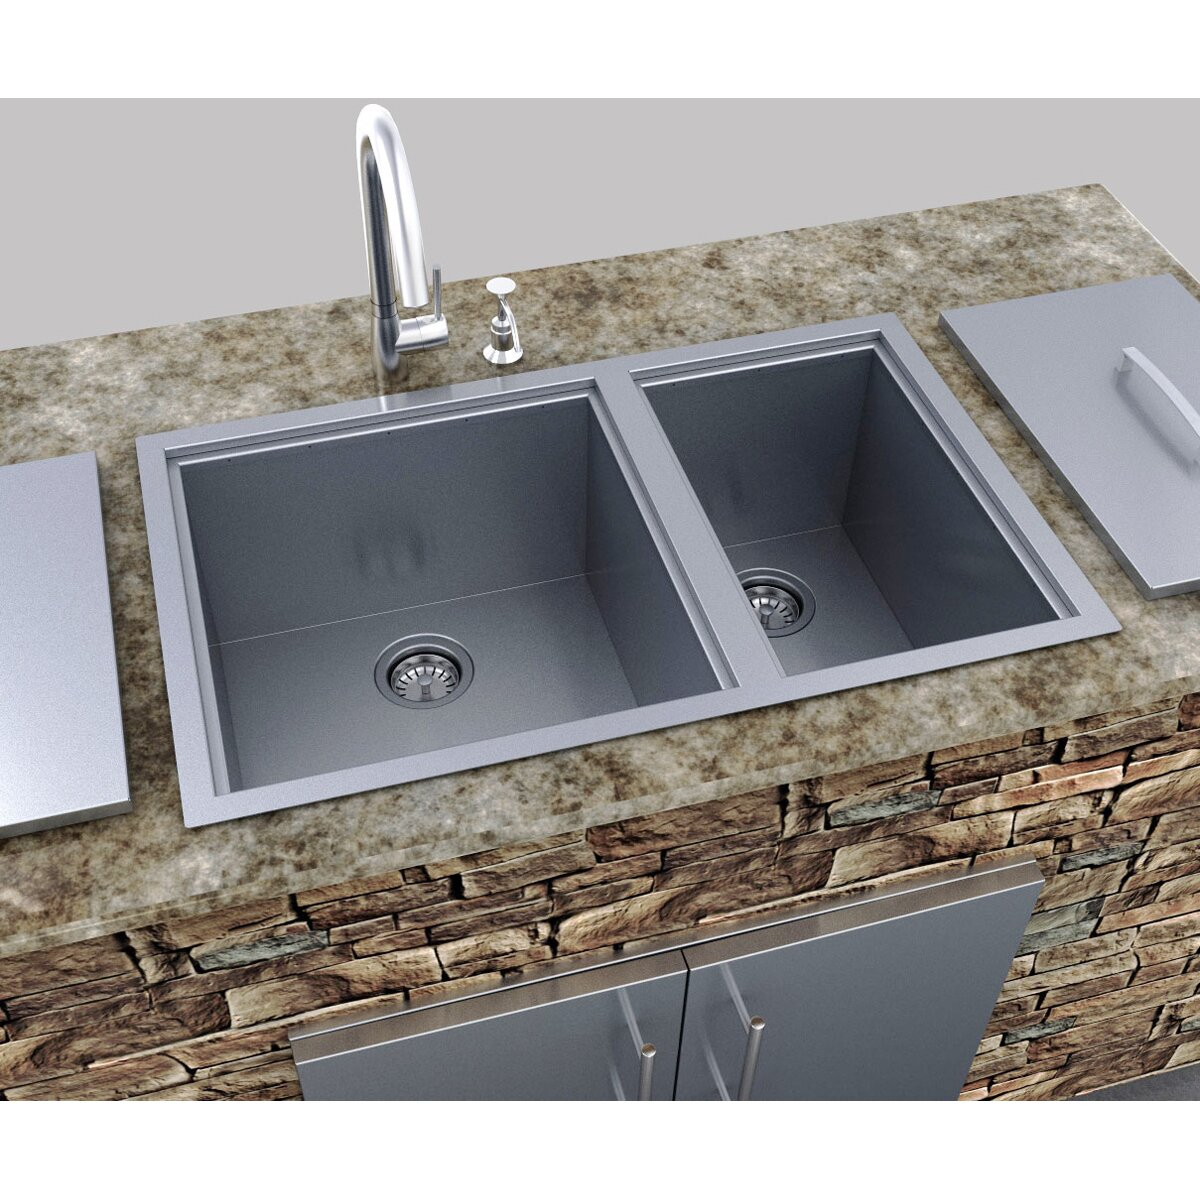 Outdoor Kitchen Sinks: Sunstone Grills Outdoor Kitchen Over / Under Double Basin